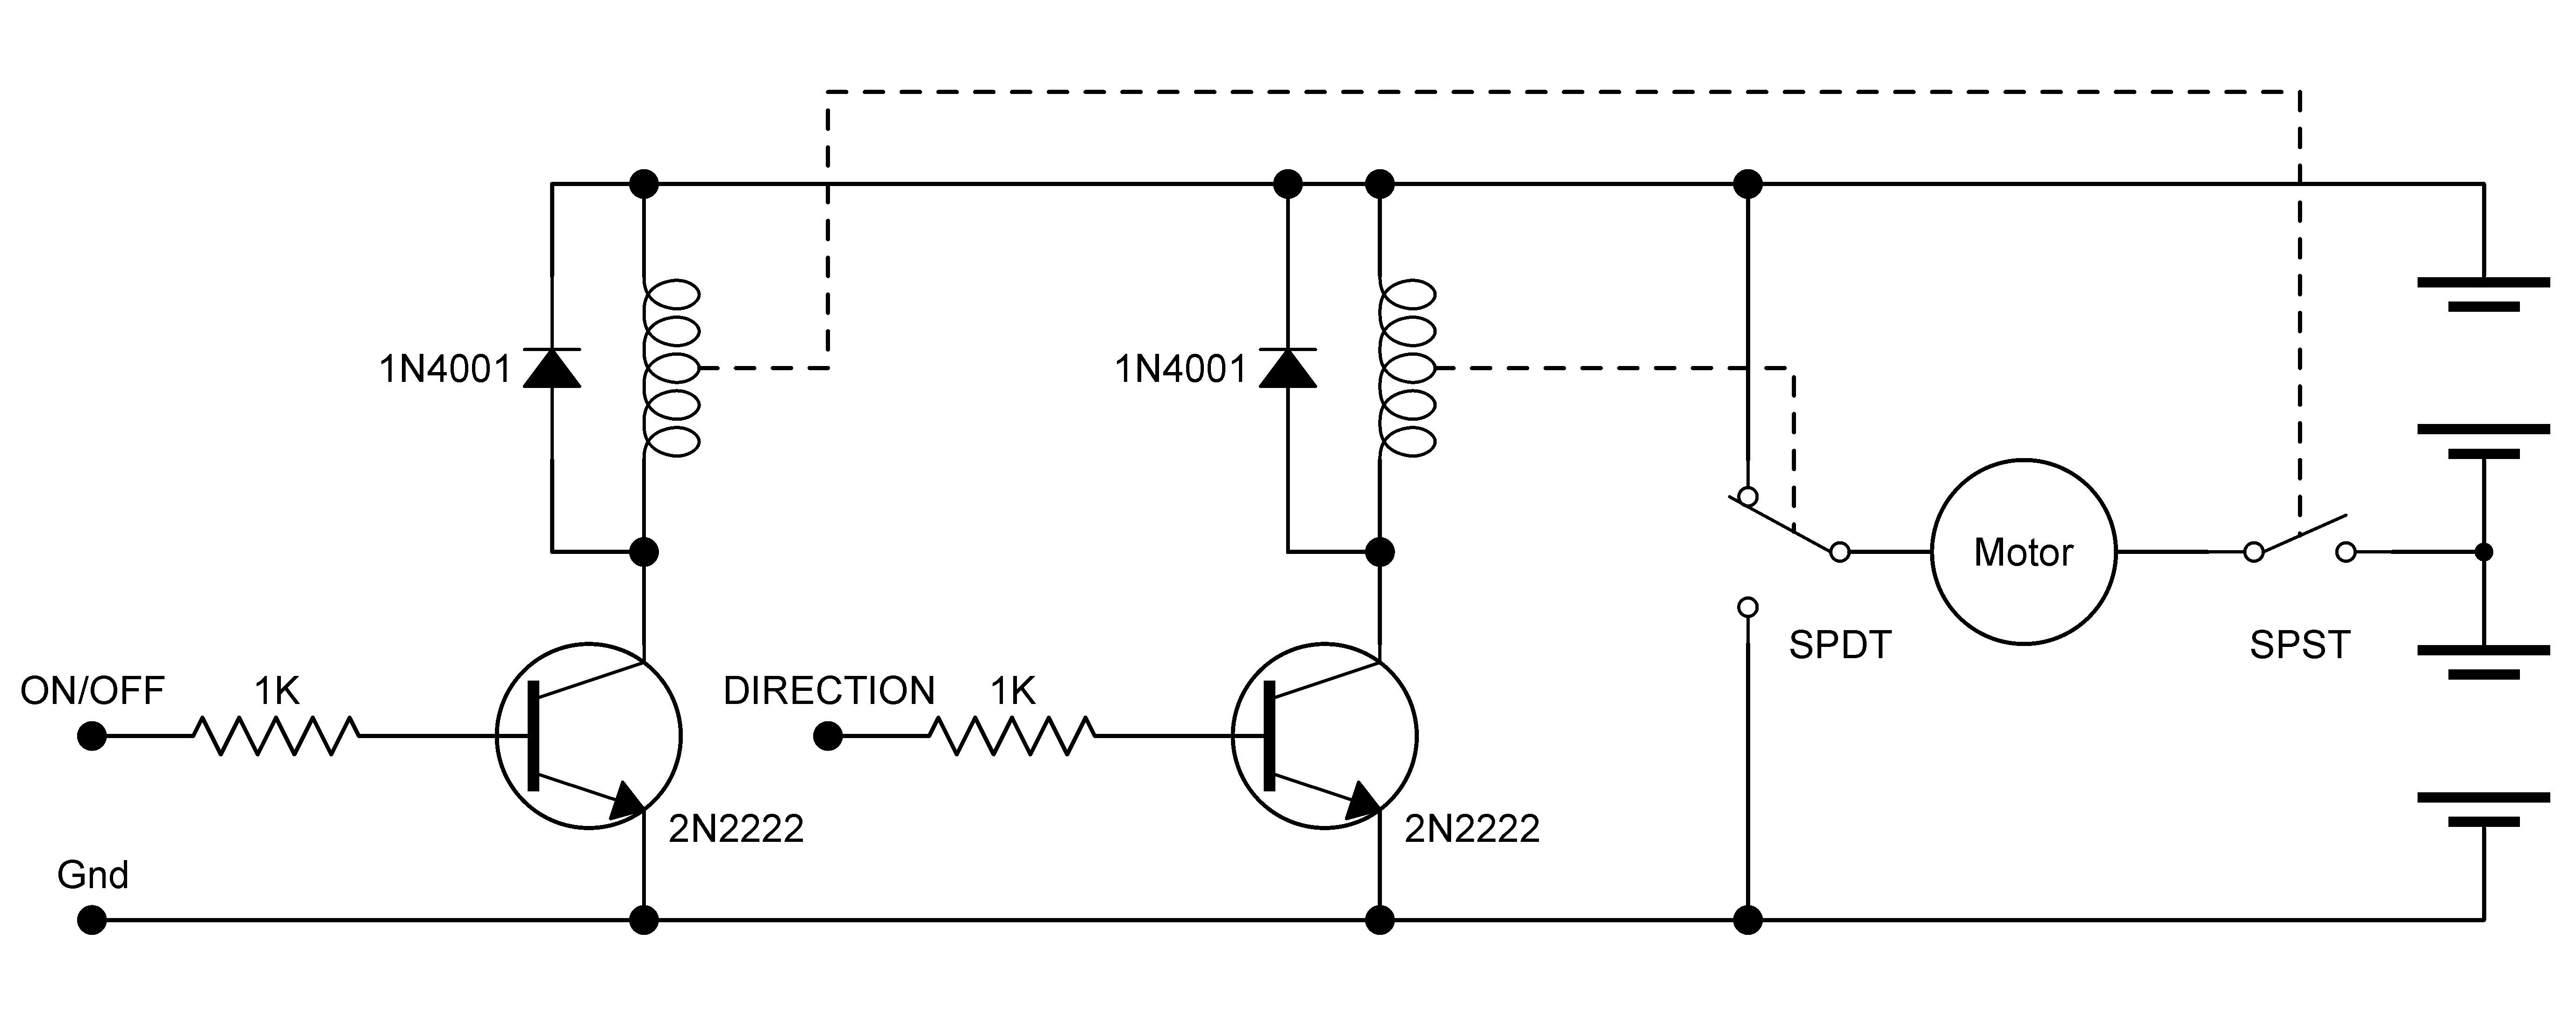 ponent H Bridge Diagram N Channel Mosfet Using Motor Bridges Ups Circuit Re